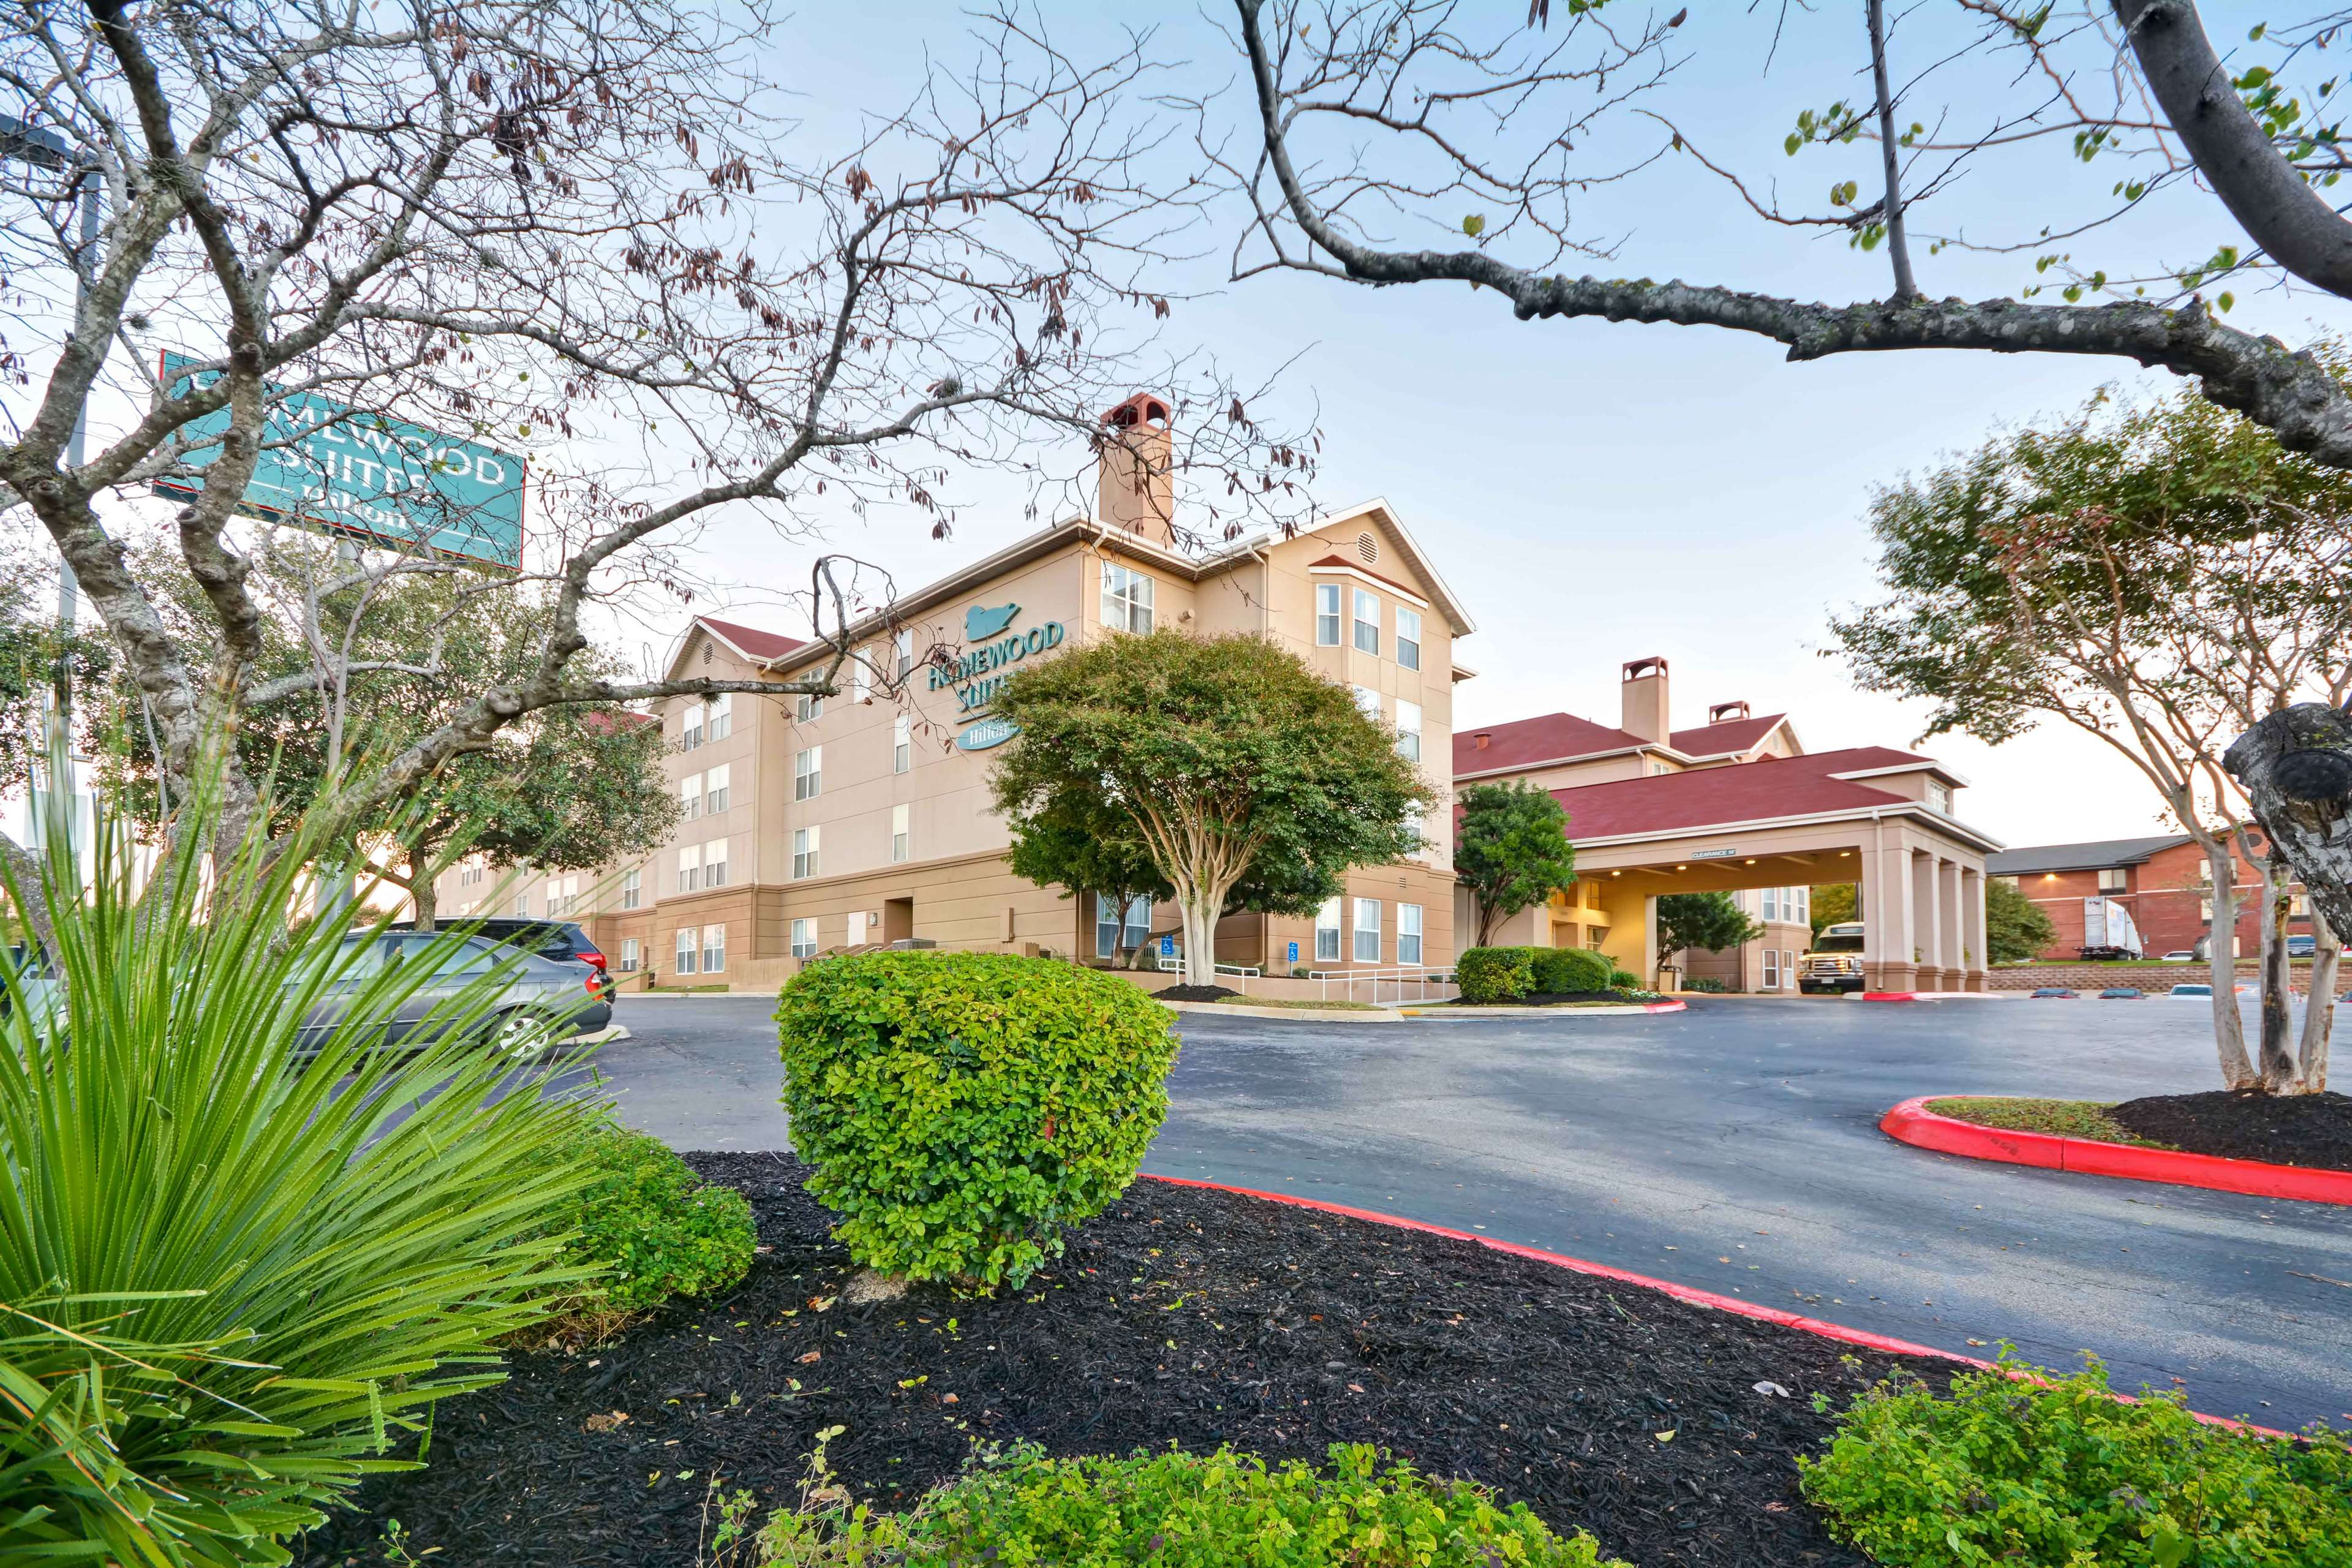 Homewood Suites by Hilton San Antonio-Northwest image 0